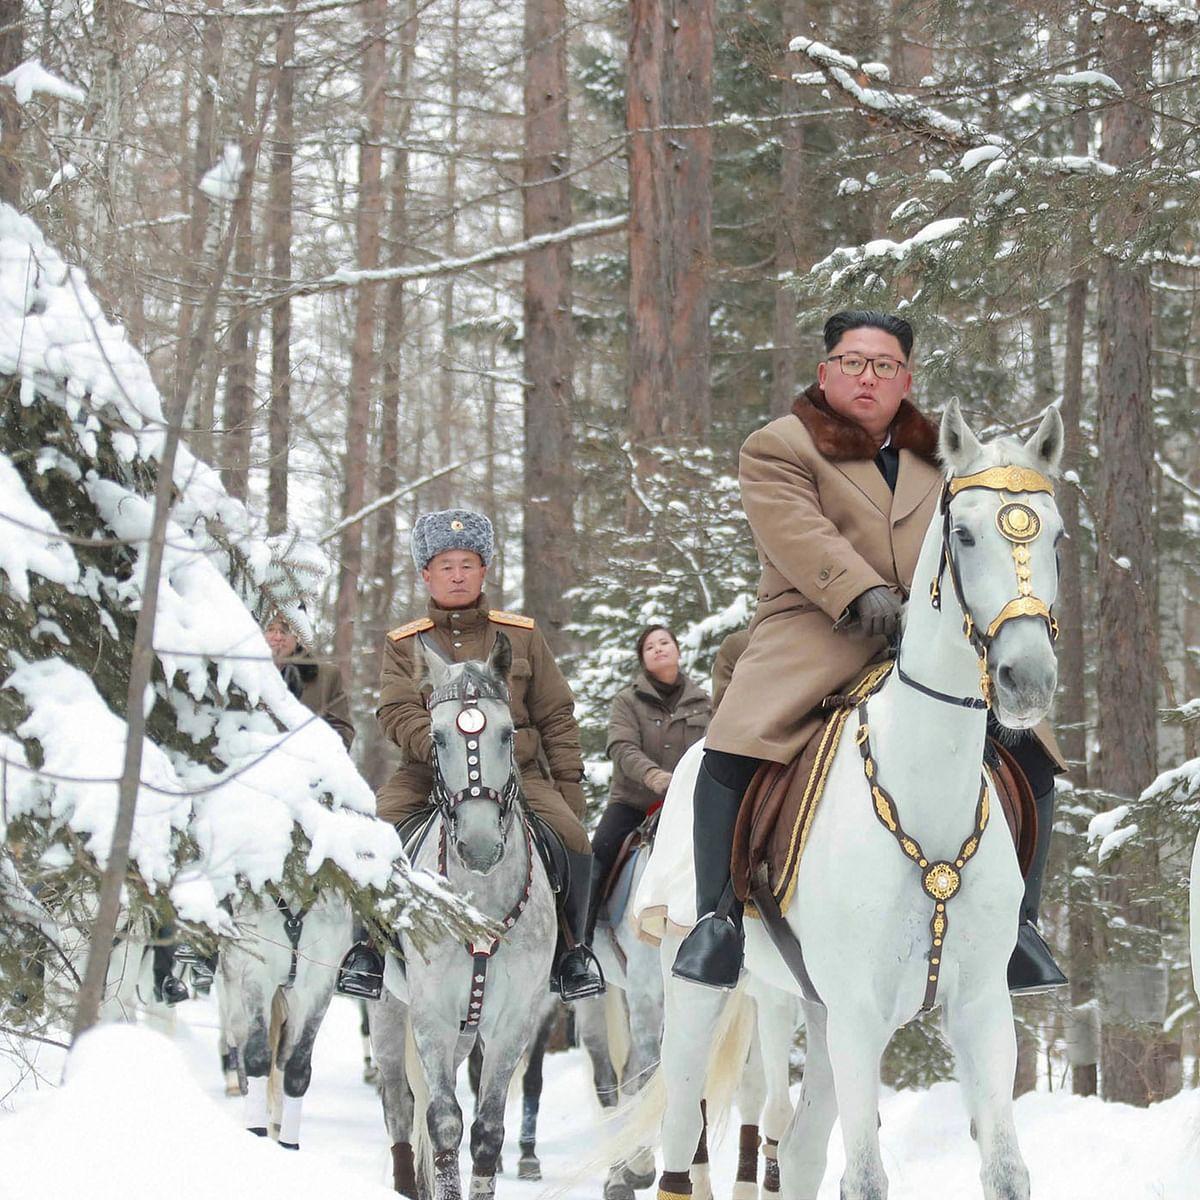 North Korean leader Kim Jong Un rides up Mount Paektu